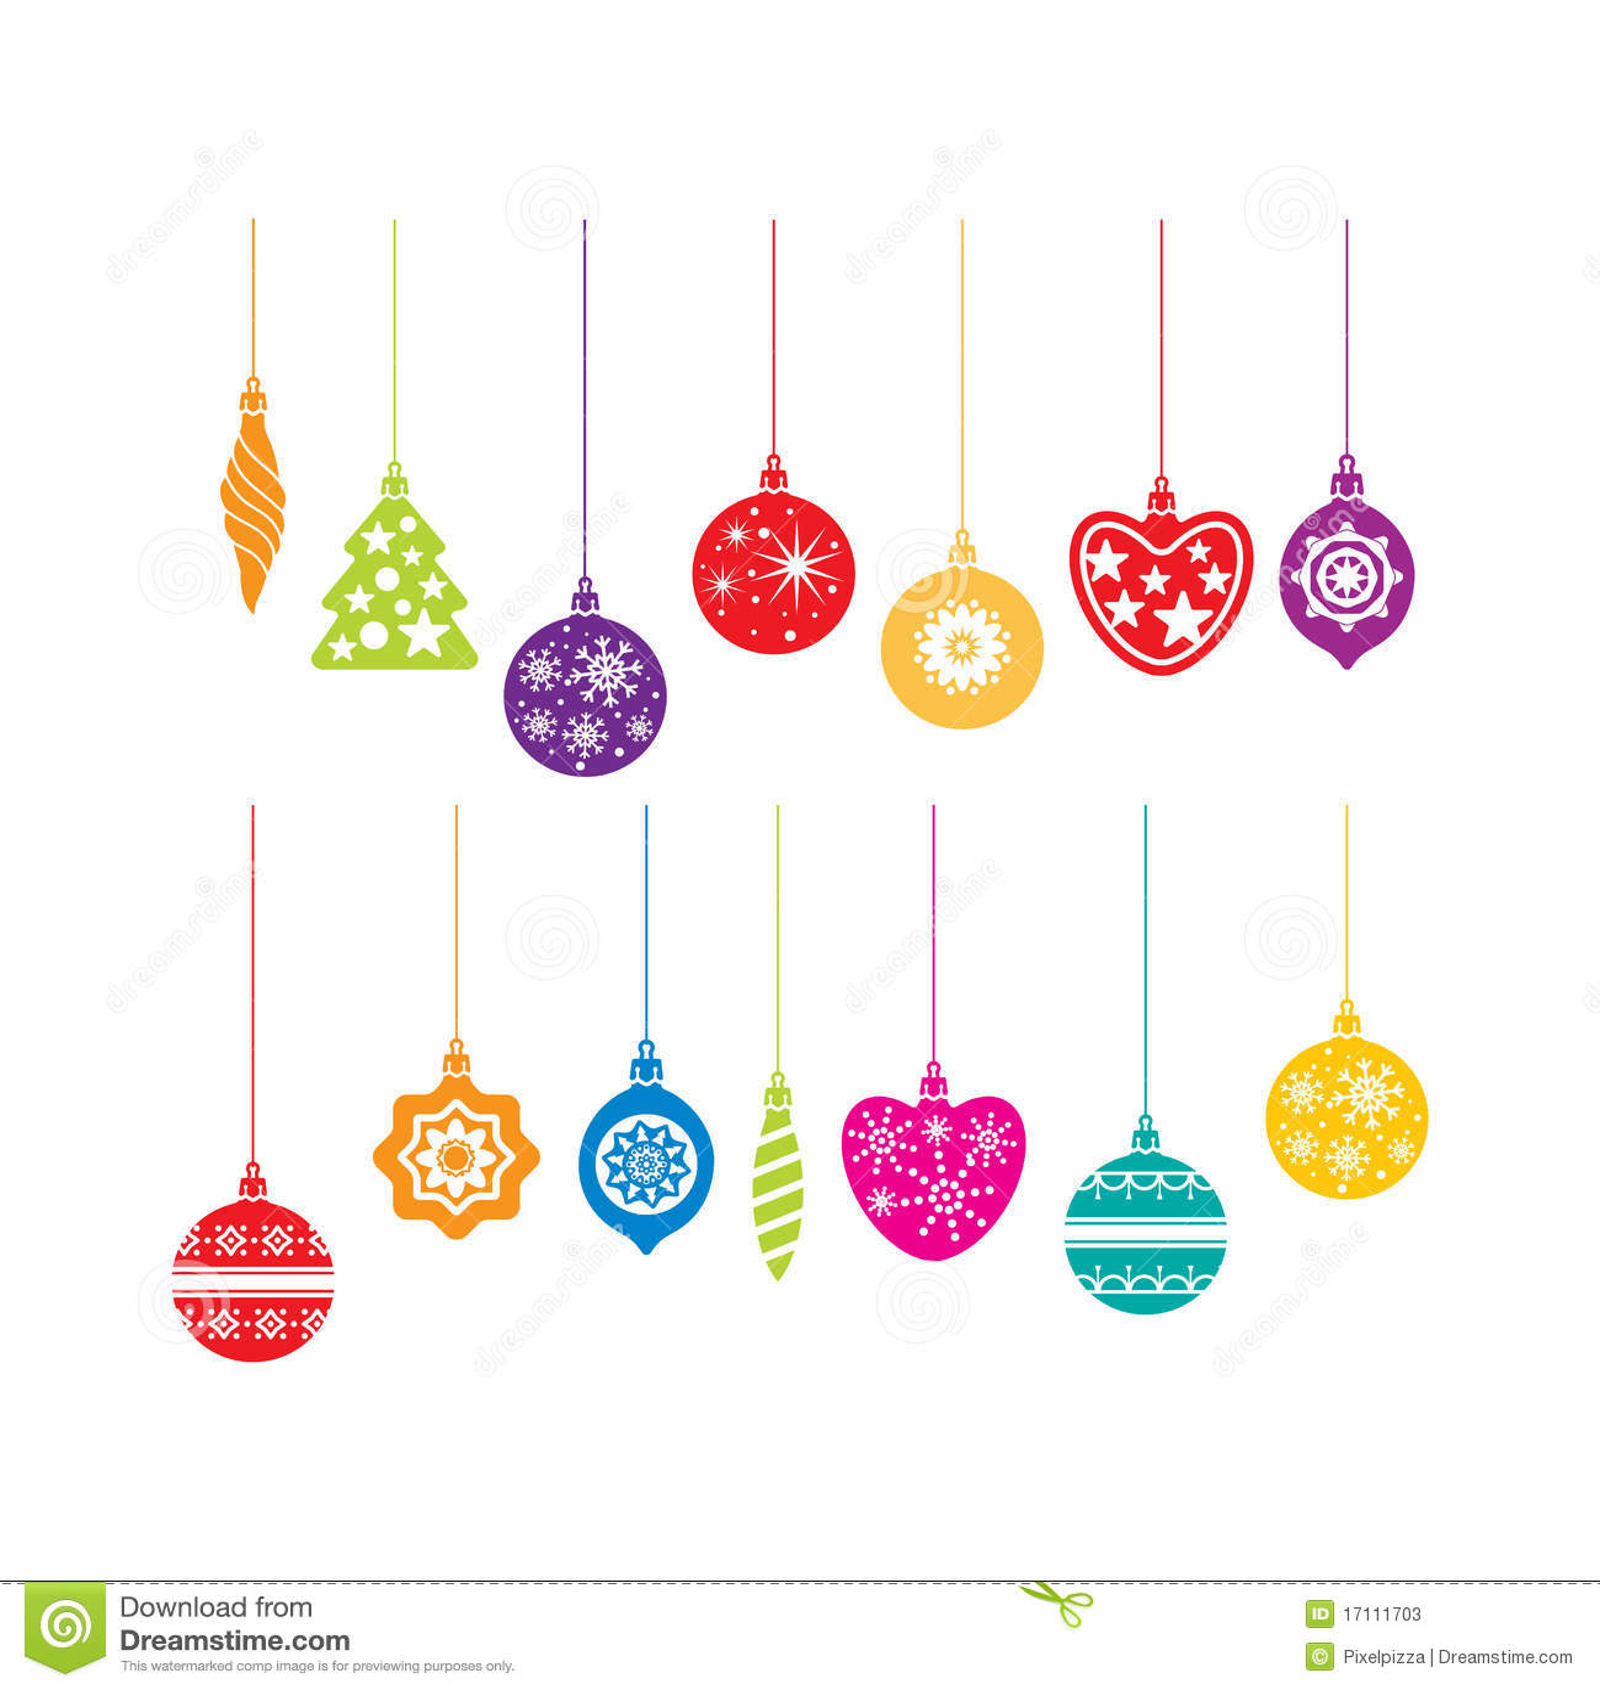 Christmas Decoration Icons Stock Photos - Image: 17111703